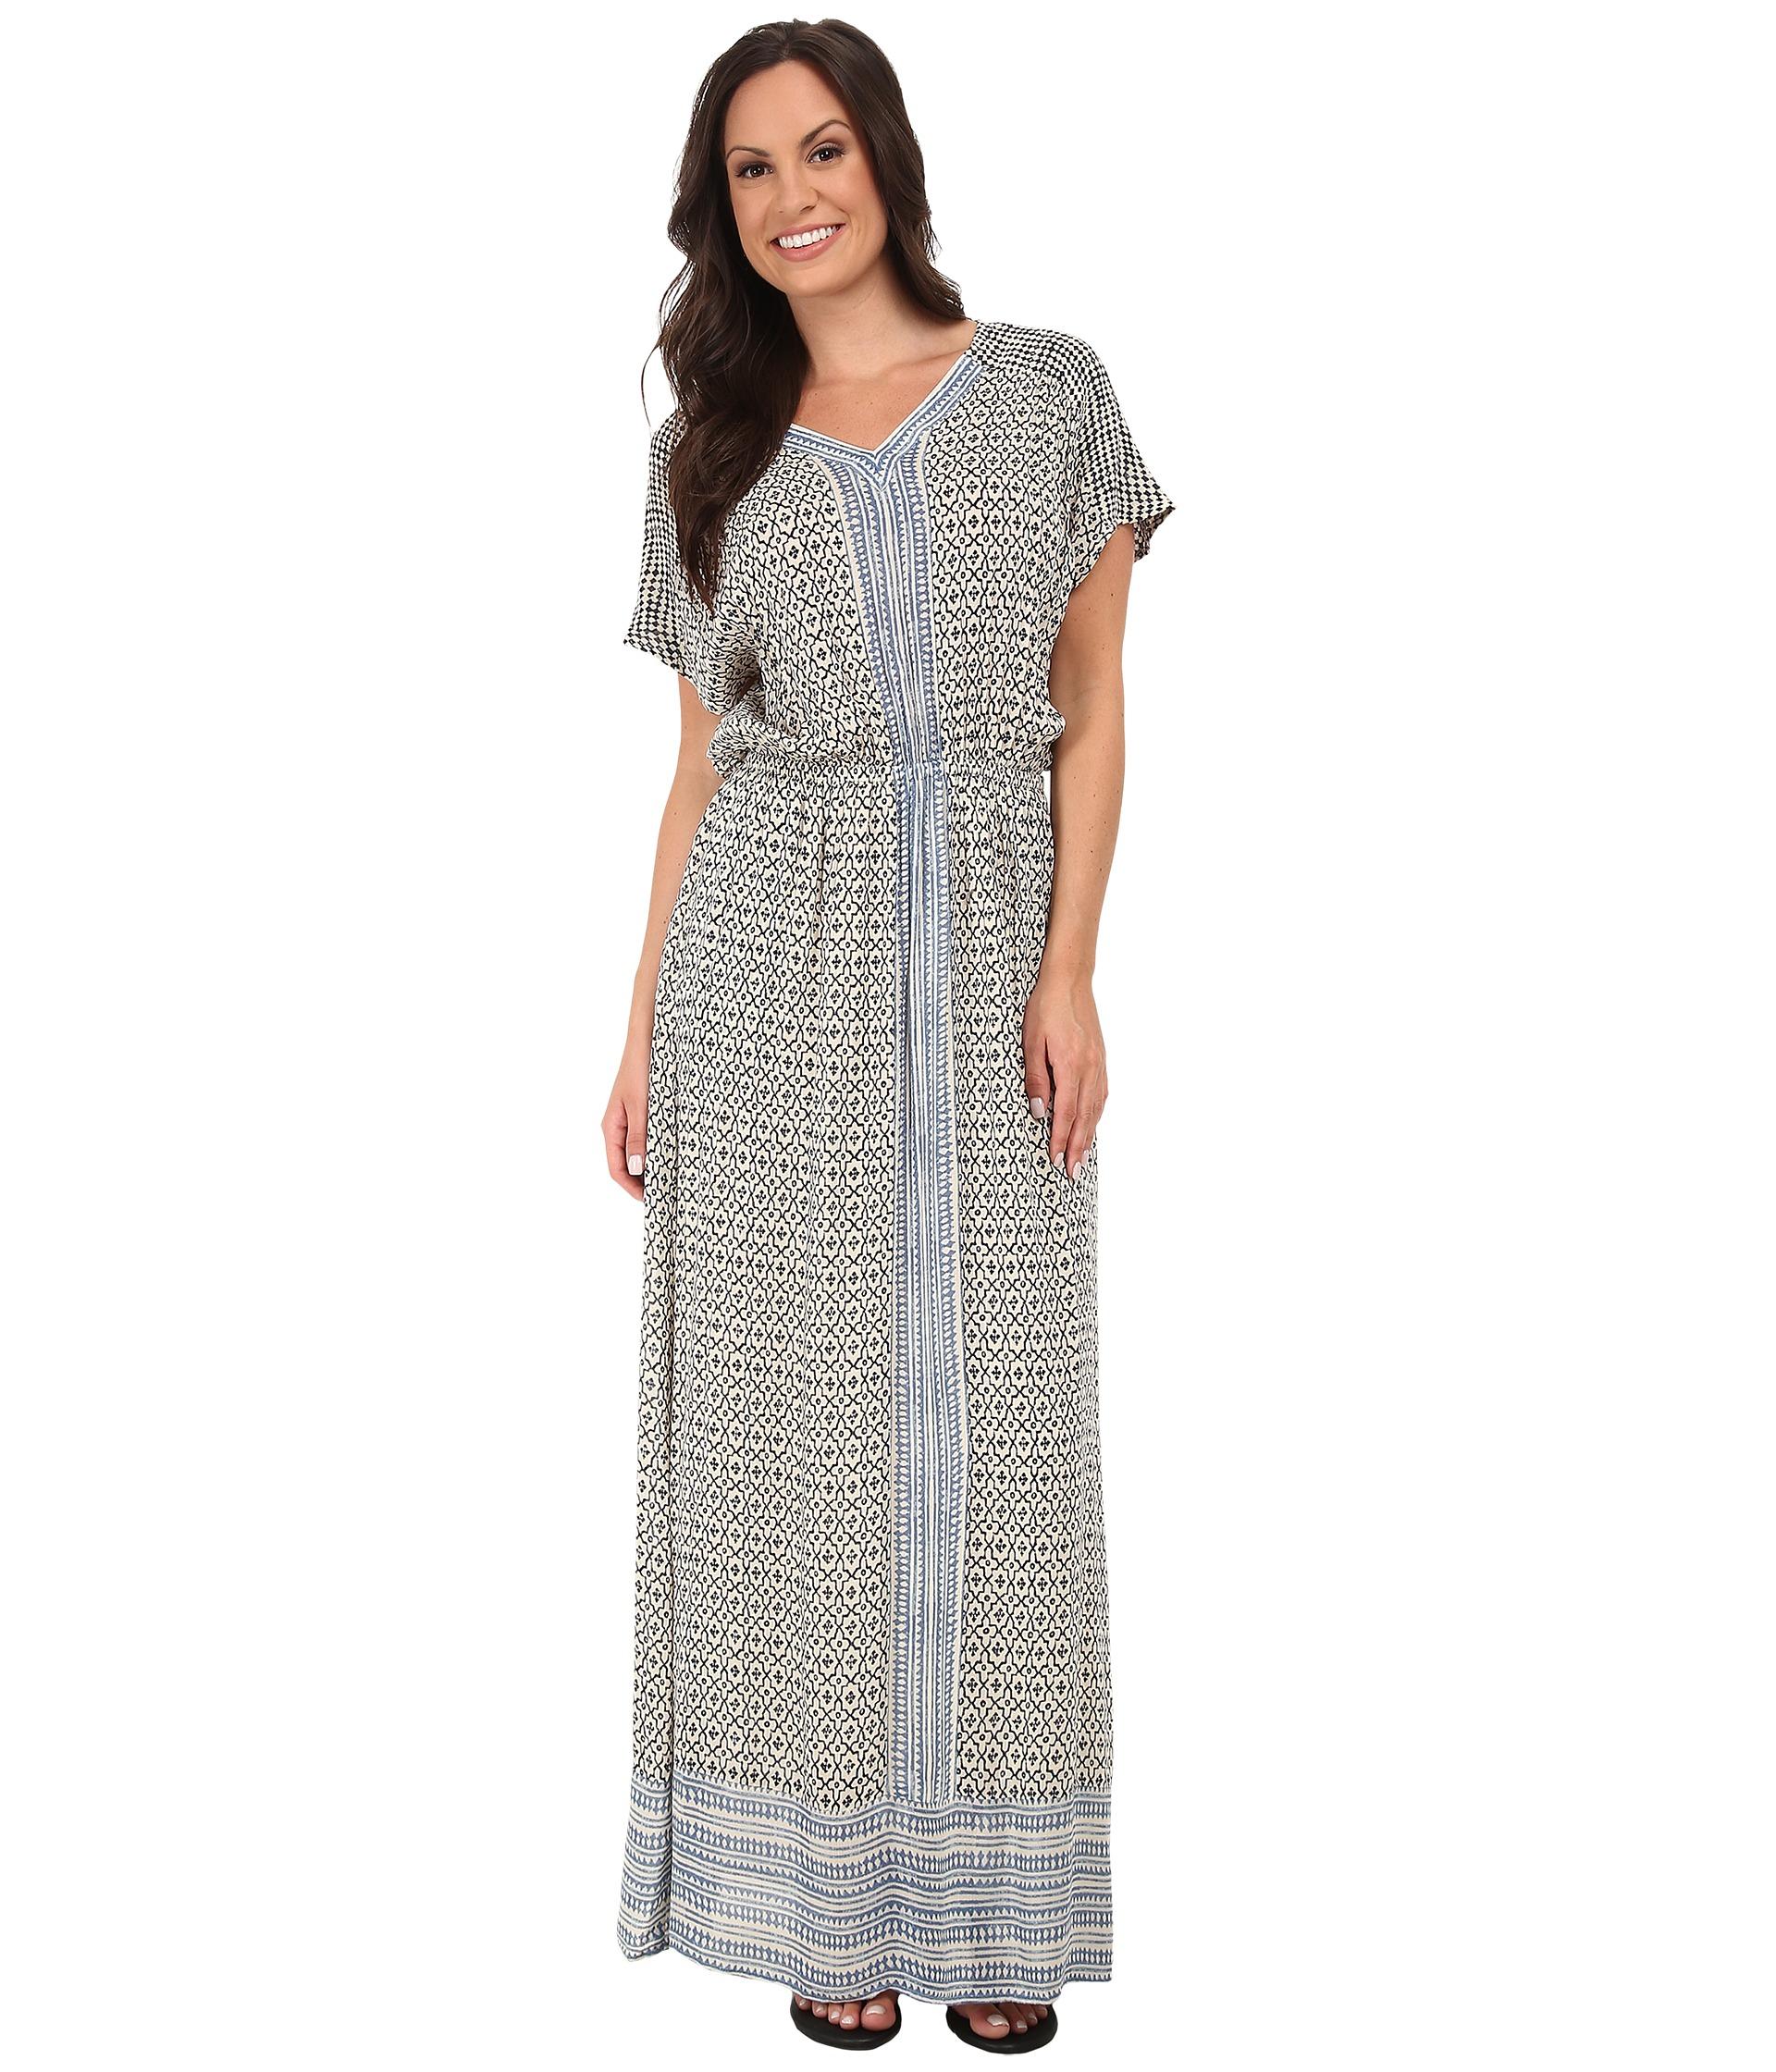 e229b46f400 Lucky Brand Tiered Maxi Dress - Data Dynamic AG